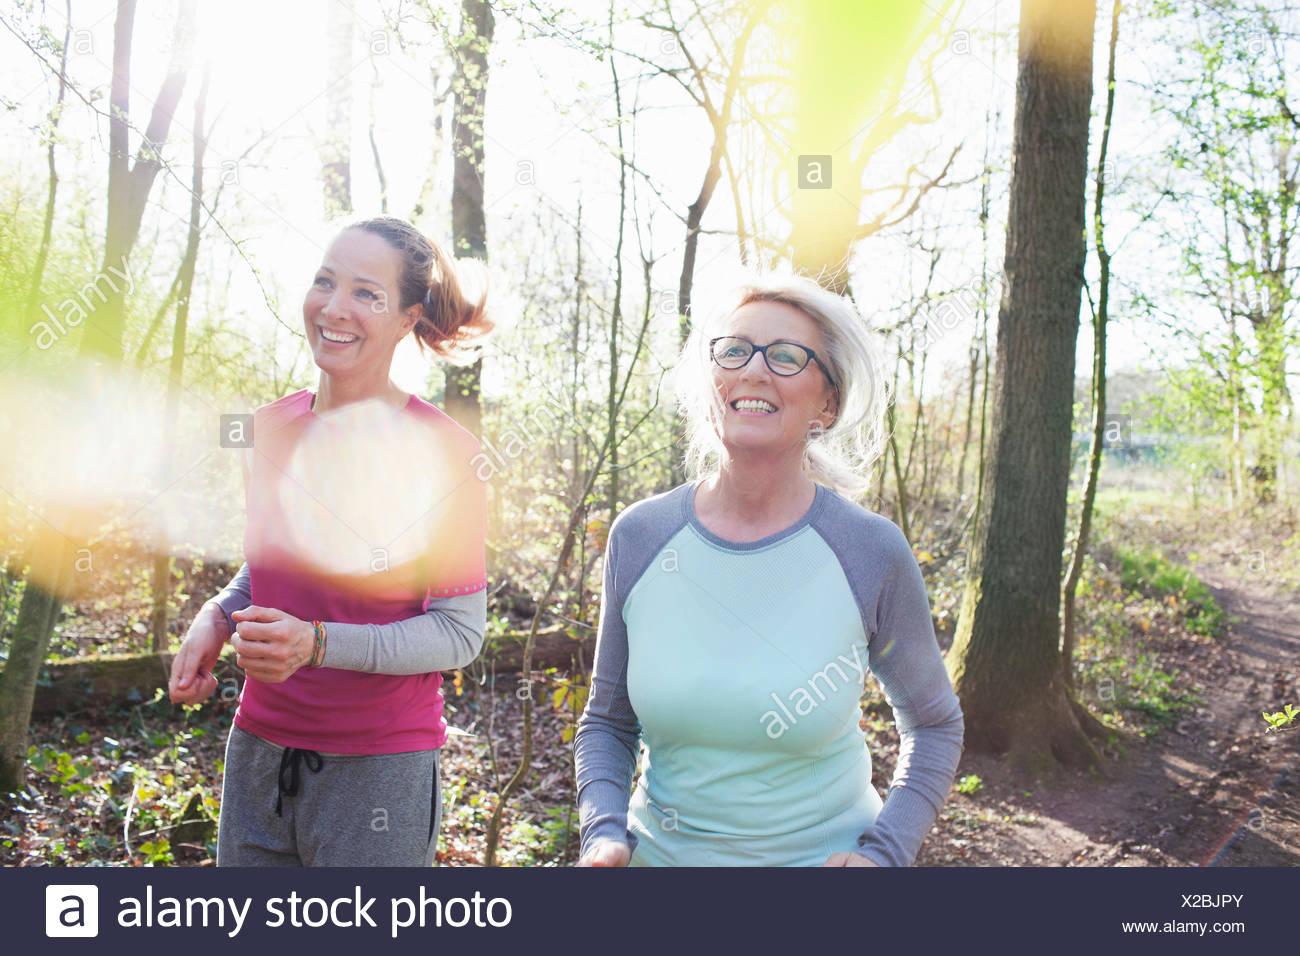 Frauen Joggen im Wald lächelnd Stockbild